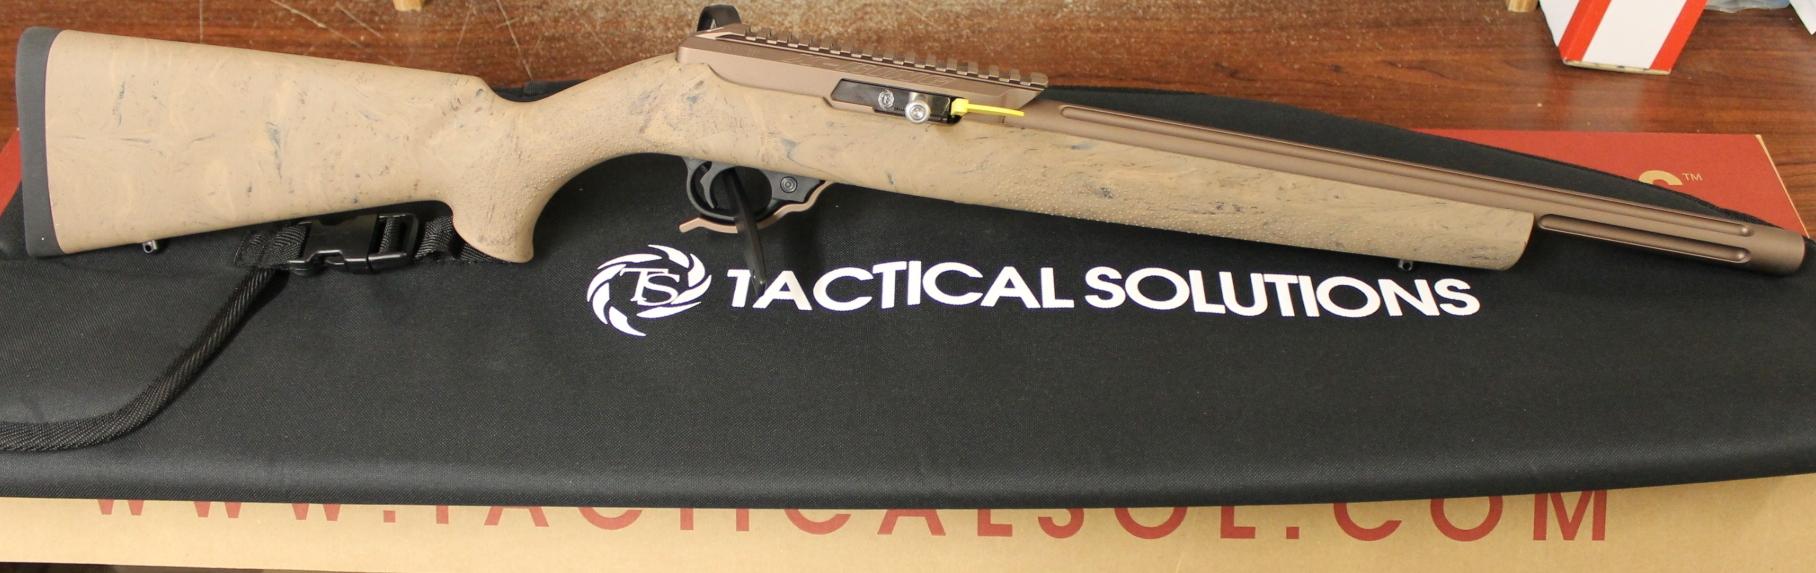 TacSol X-Ring Rifle -- Matte Brown barrel, 10/22 Trigger,